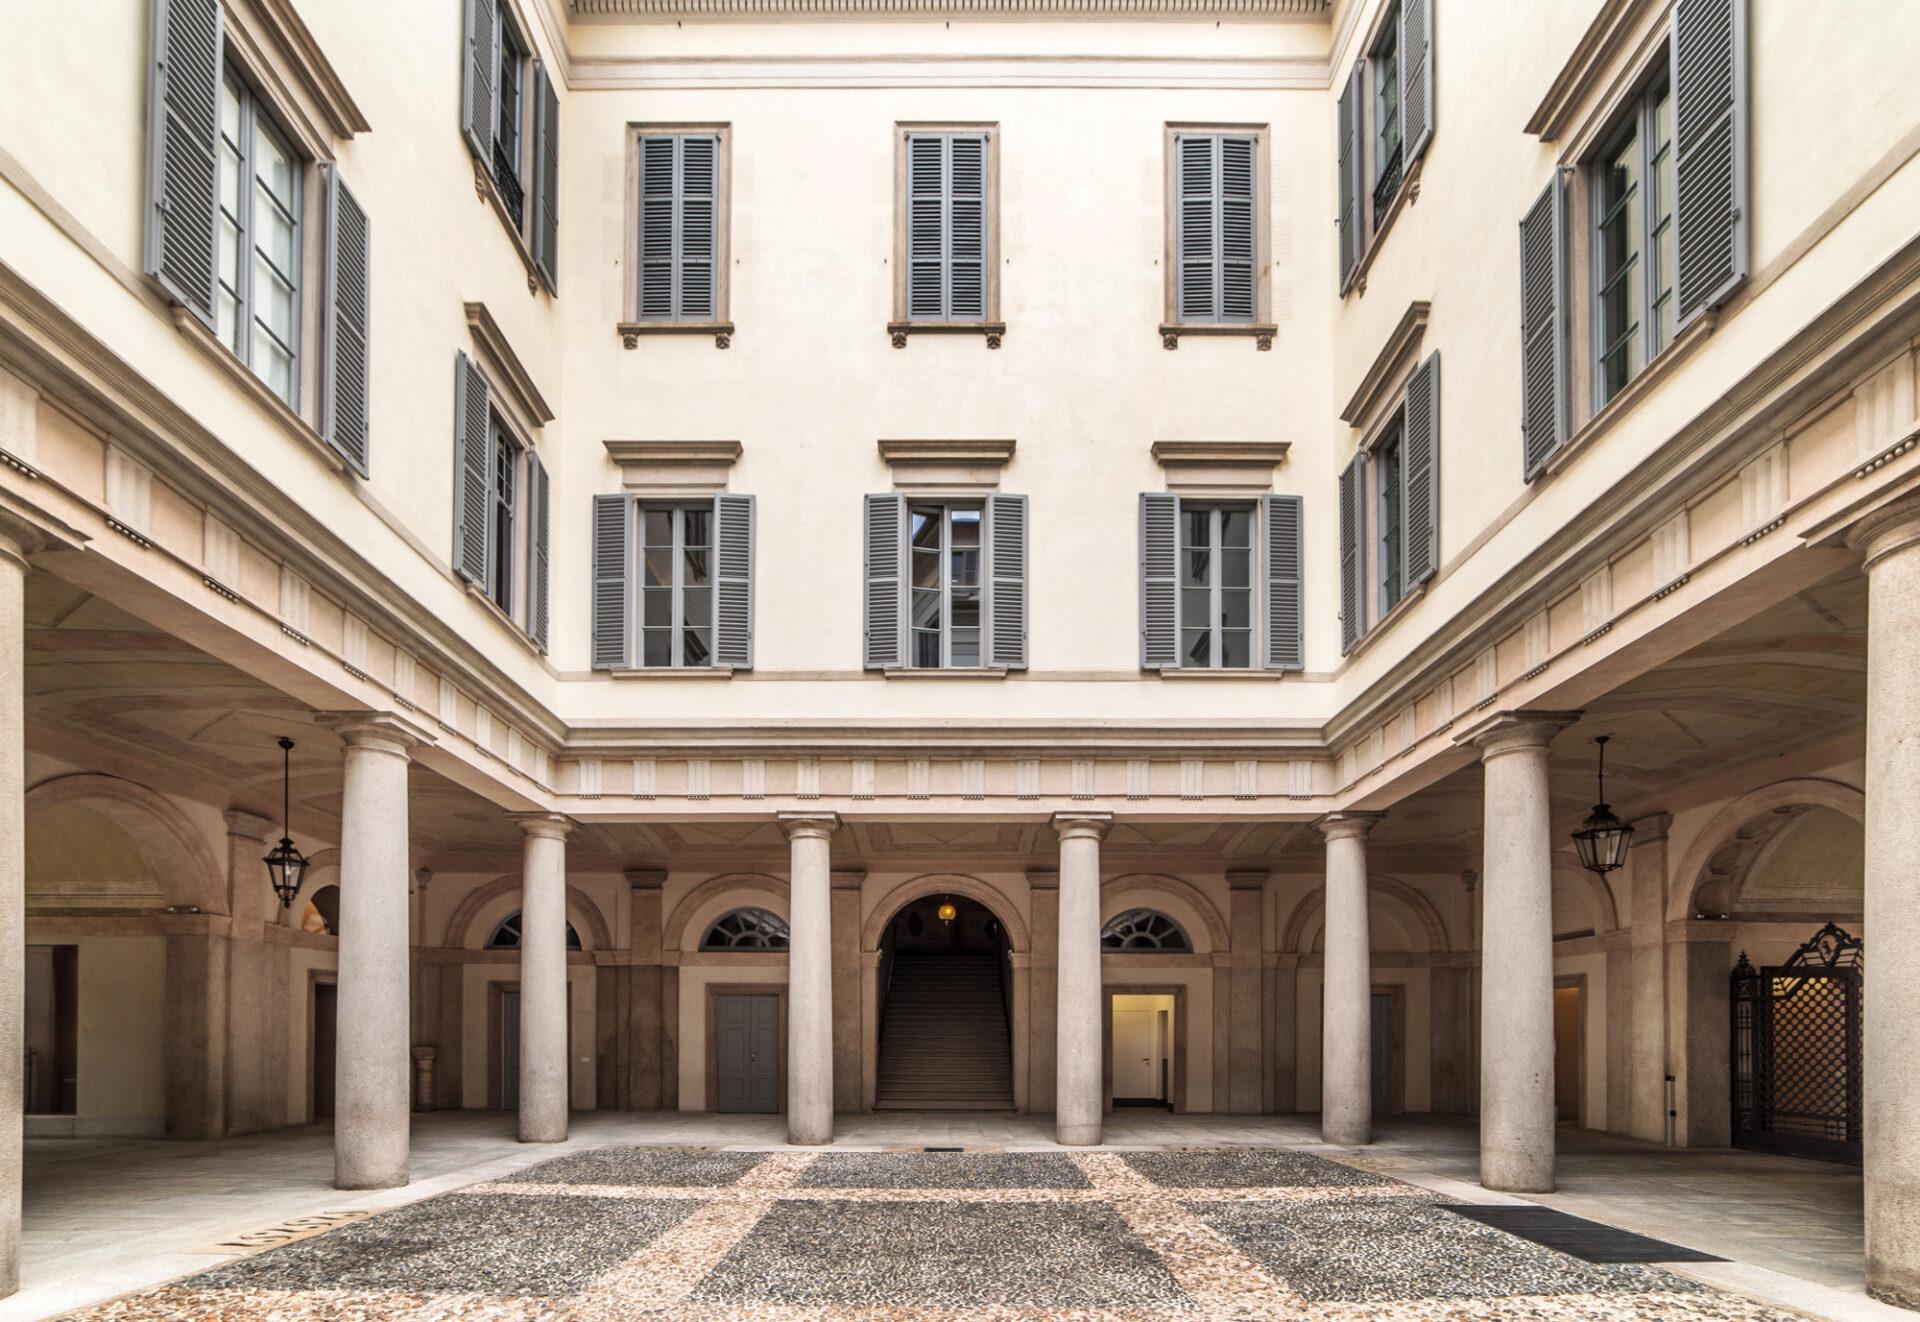 Cusani 5 Milano - Cortile - Immobili Cittamoderna